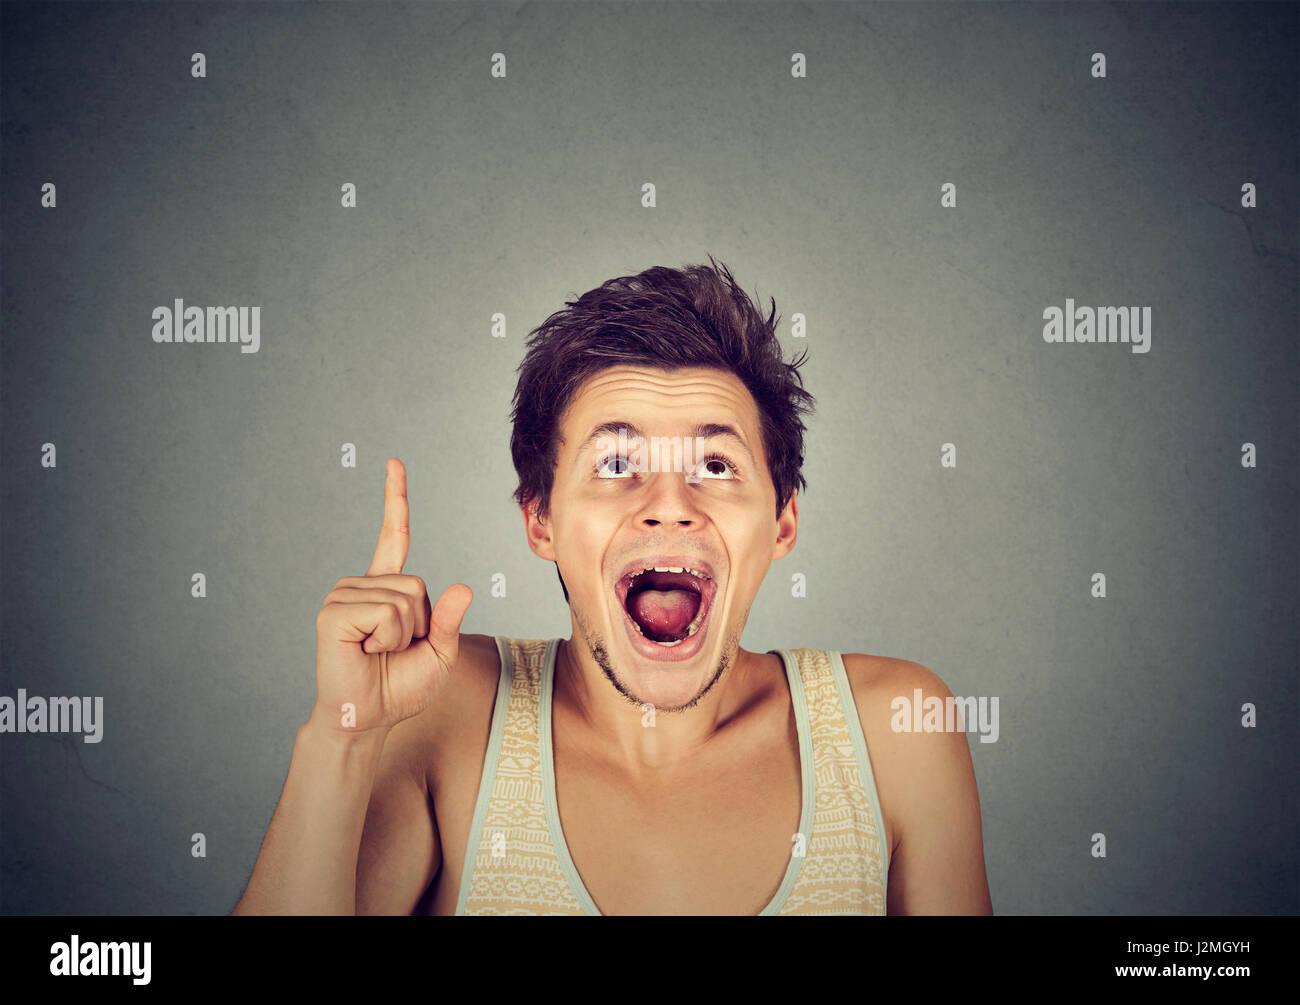 Headshot man having good idea aha thought pointing index finger up solution found isolated on grey background. Human - Stock Image